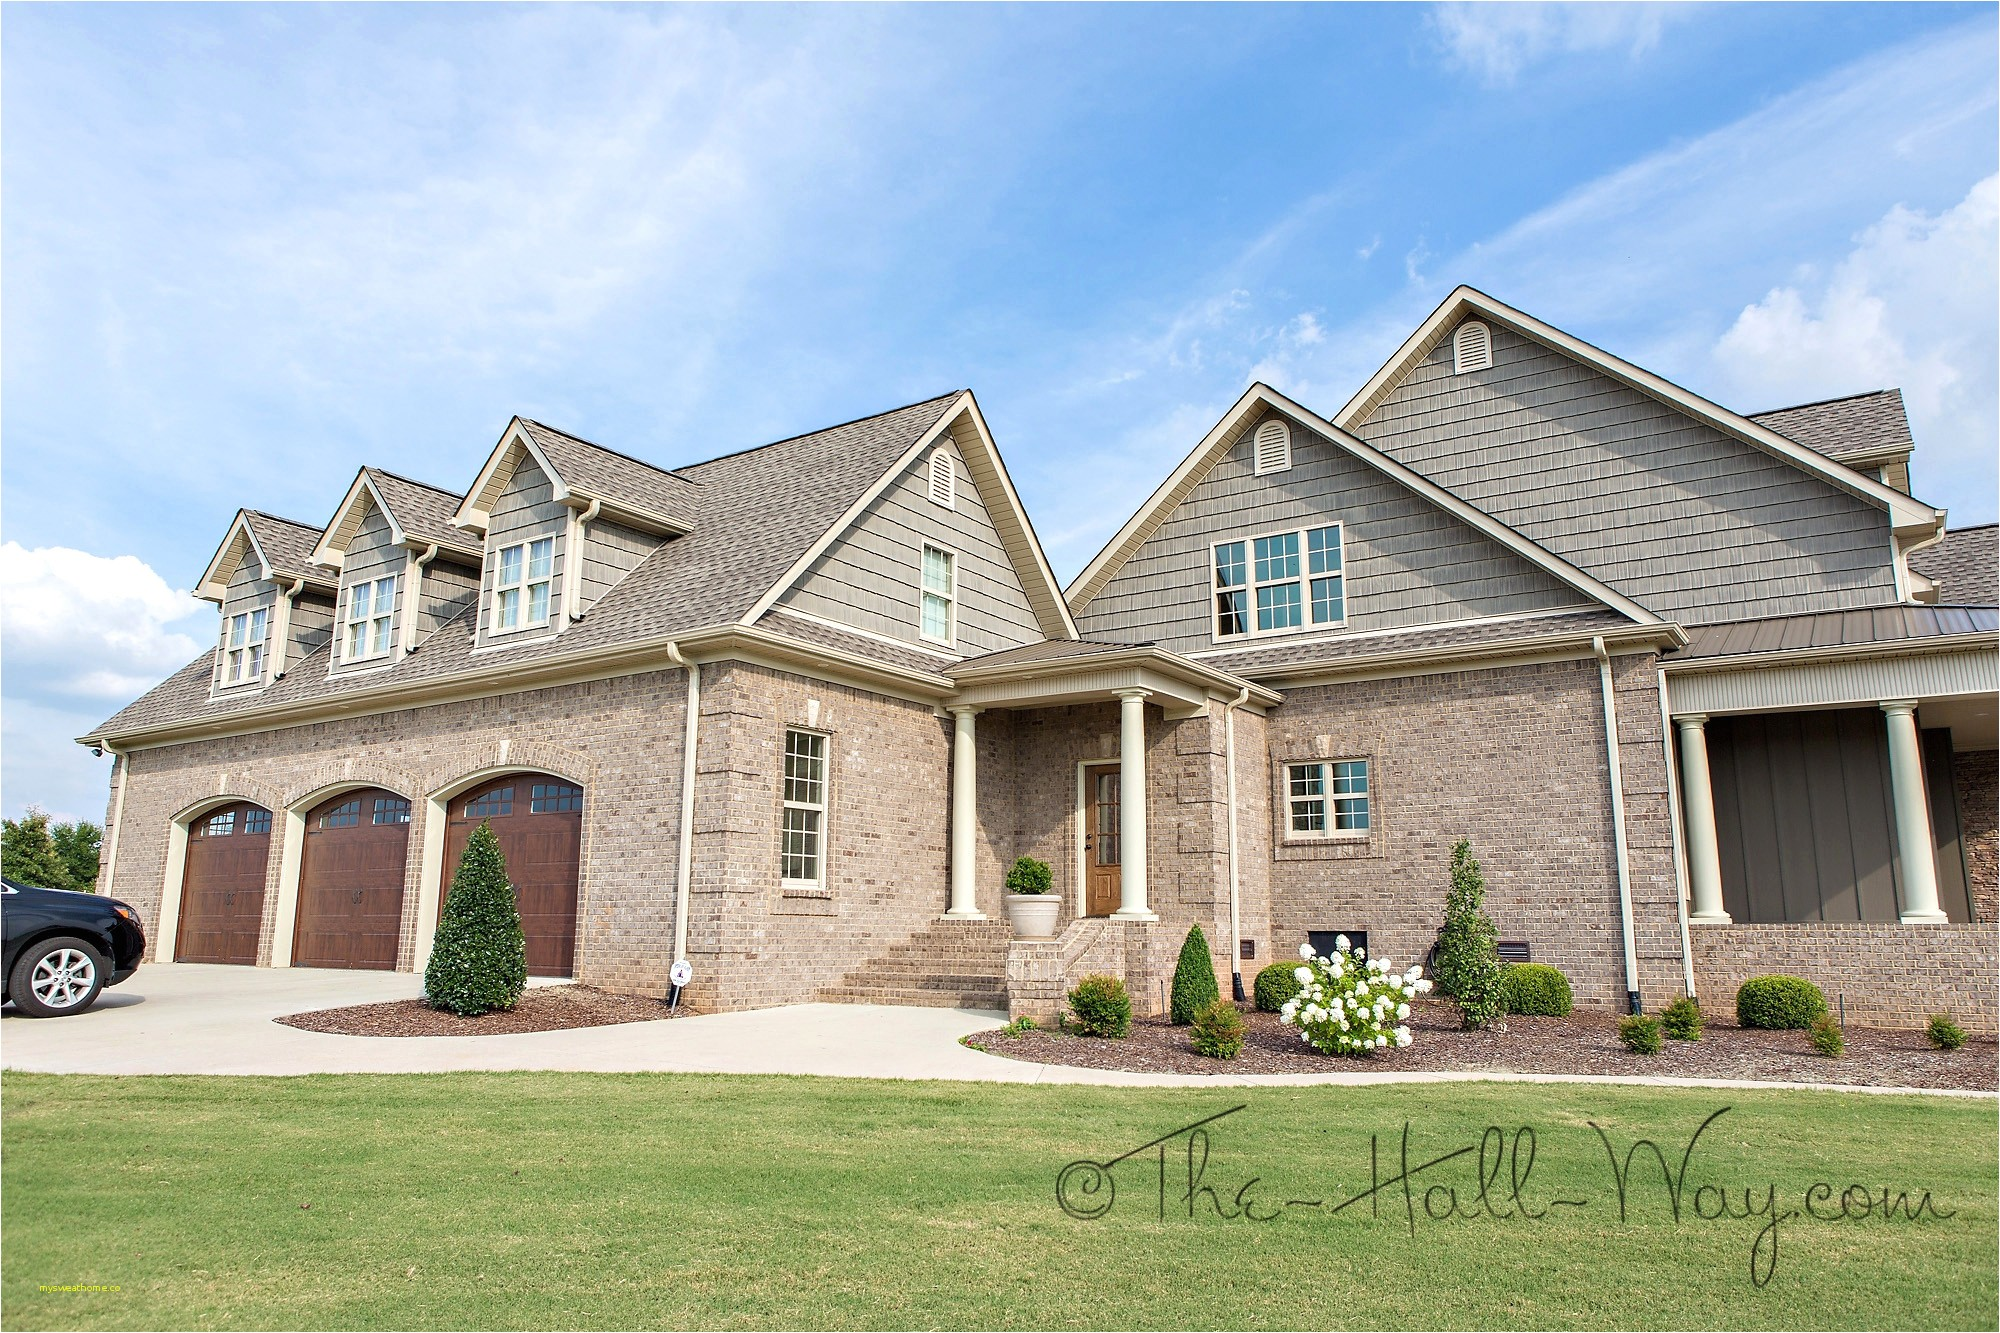 Luxury Home Plans 2018 top Result Elberton Way House Plan Photos Luxury southern